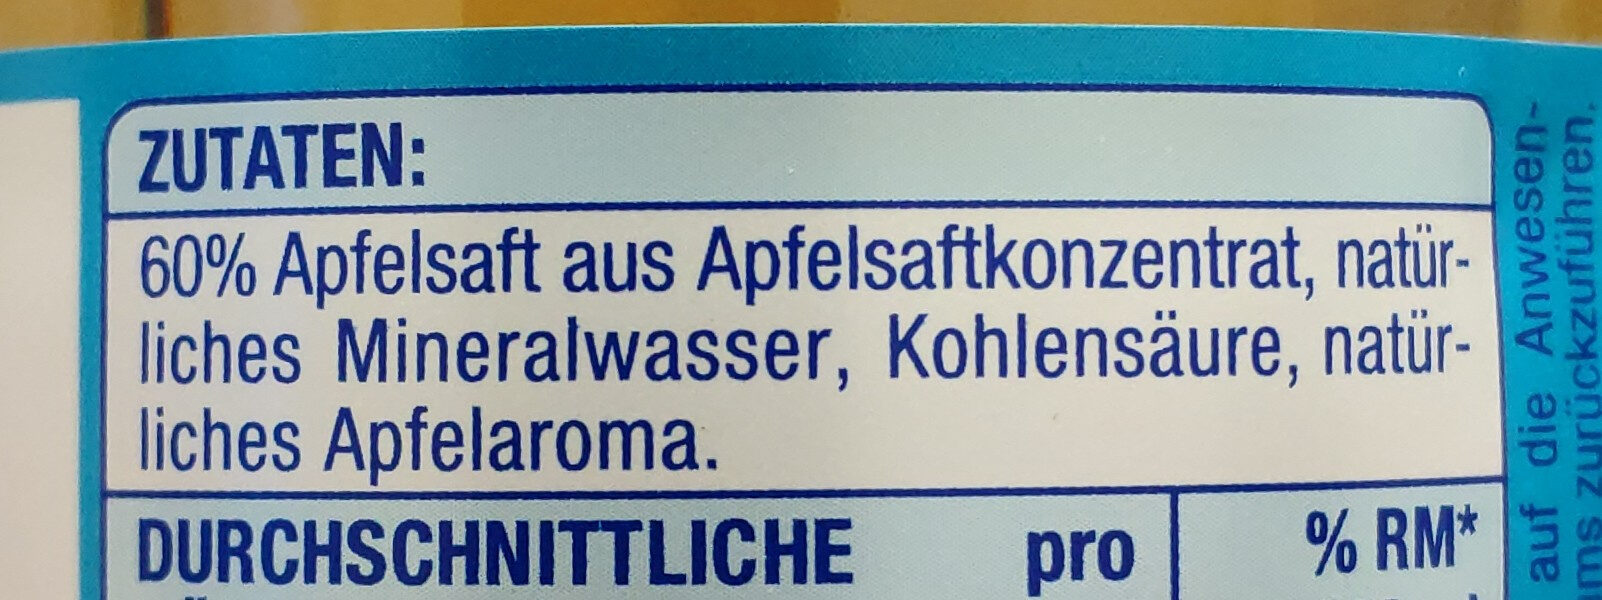 Apfel-Schorle - Ingrédients